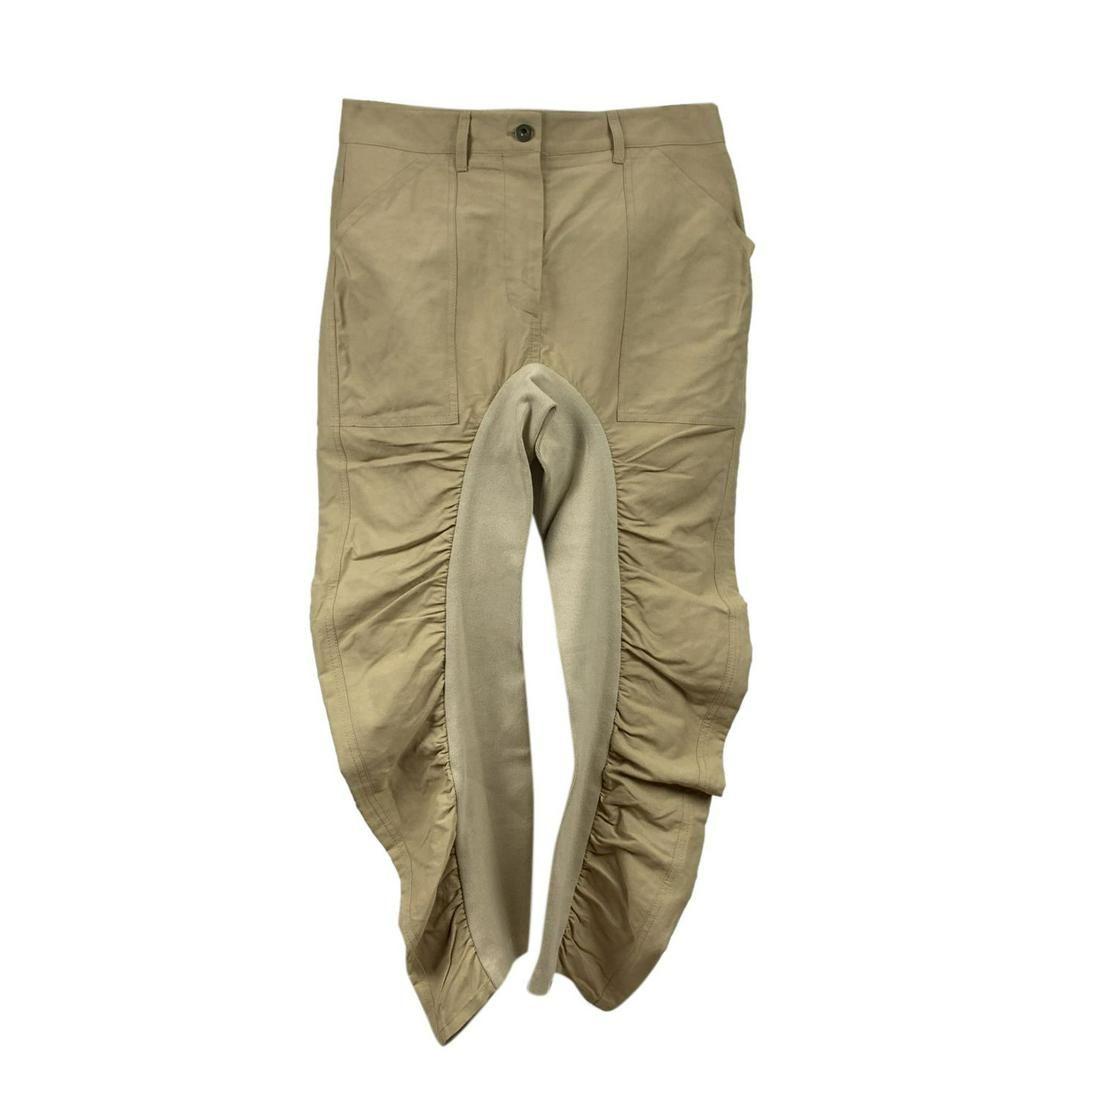 Stella McCartney Beige Tina Wrinkled Trousers Size 38